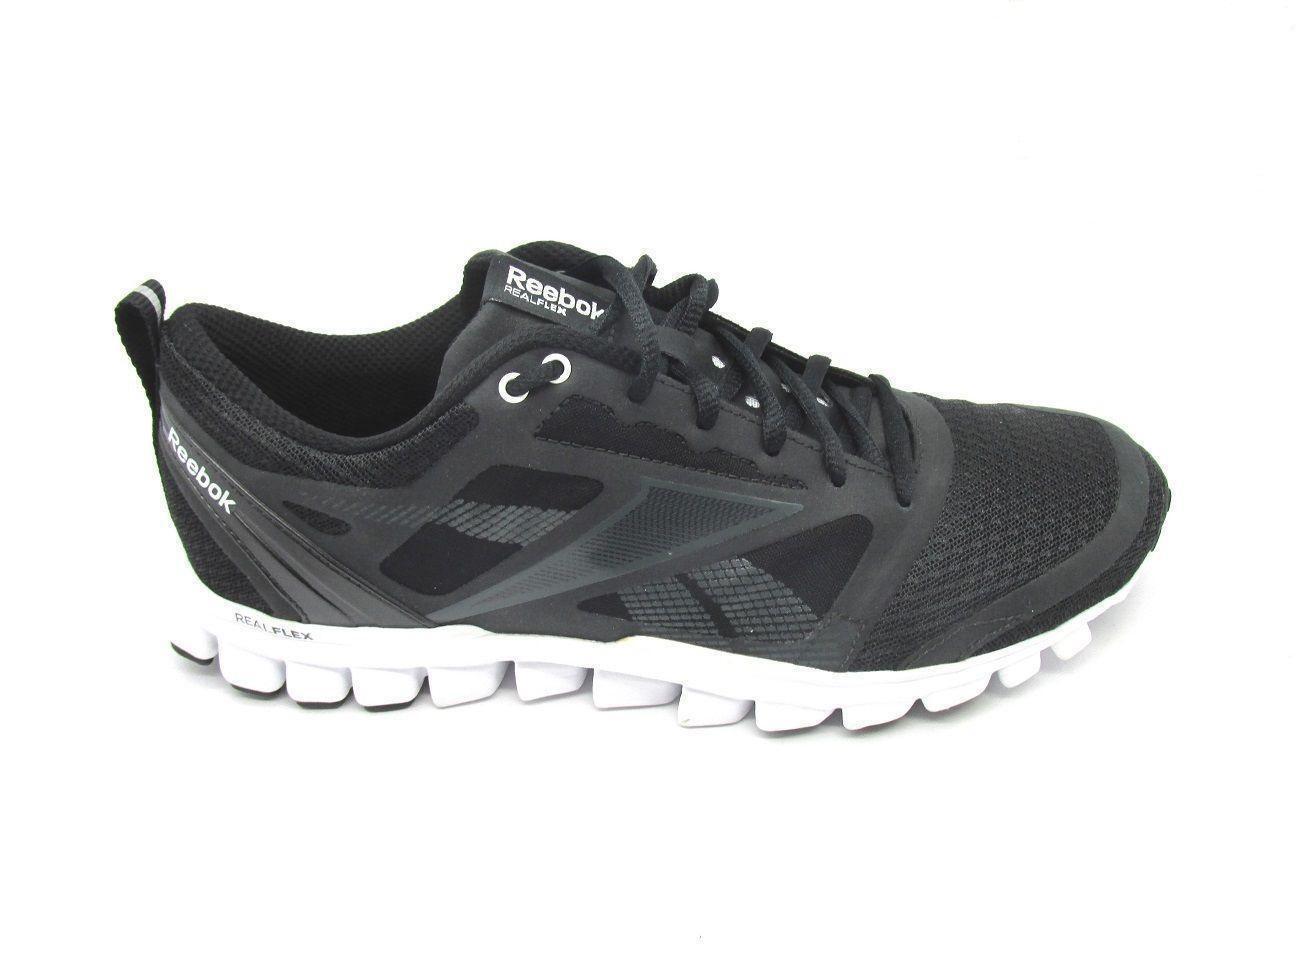 Nuovo REEBBOK REALFLEX  SPEED nero Running Trainers J90564  più economico